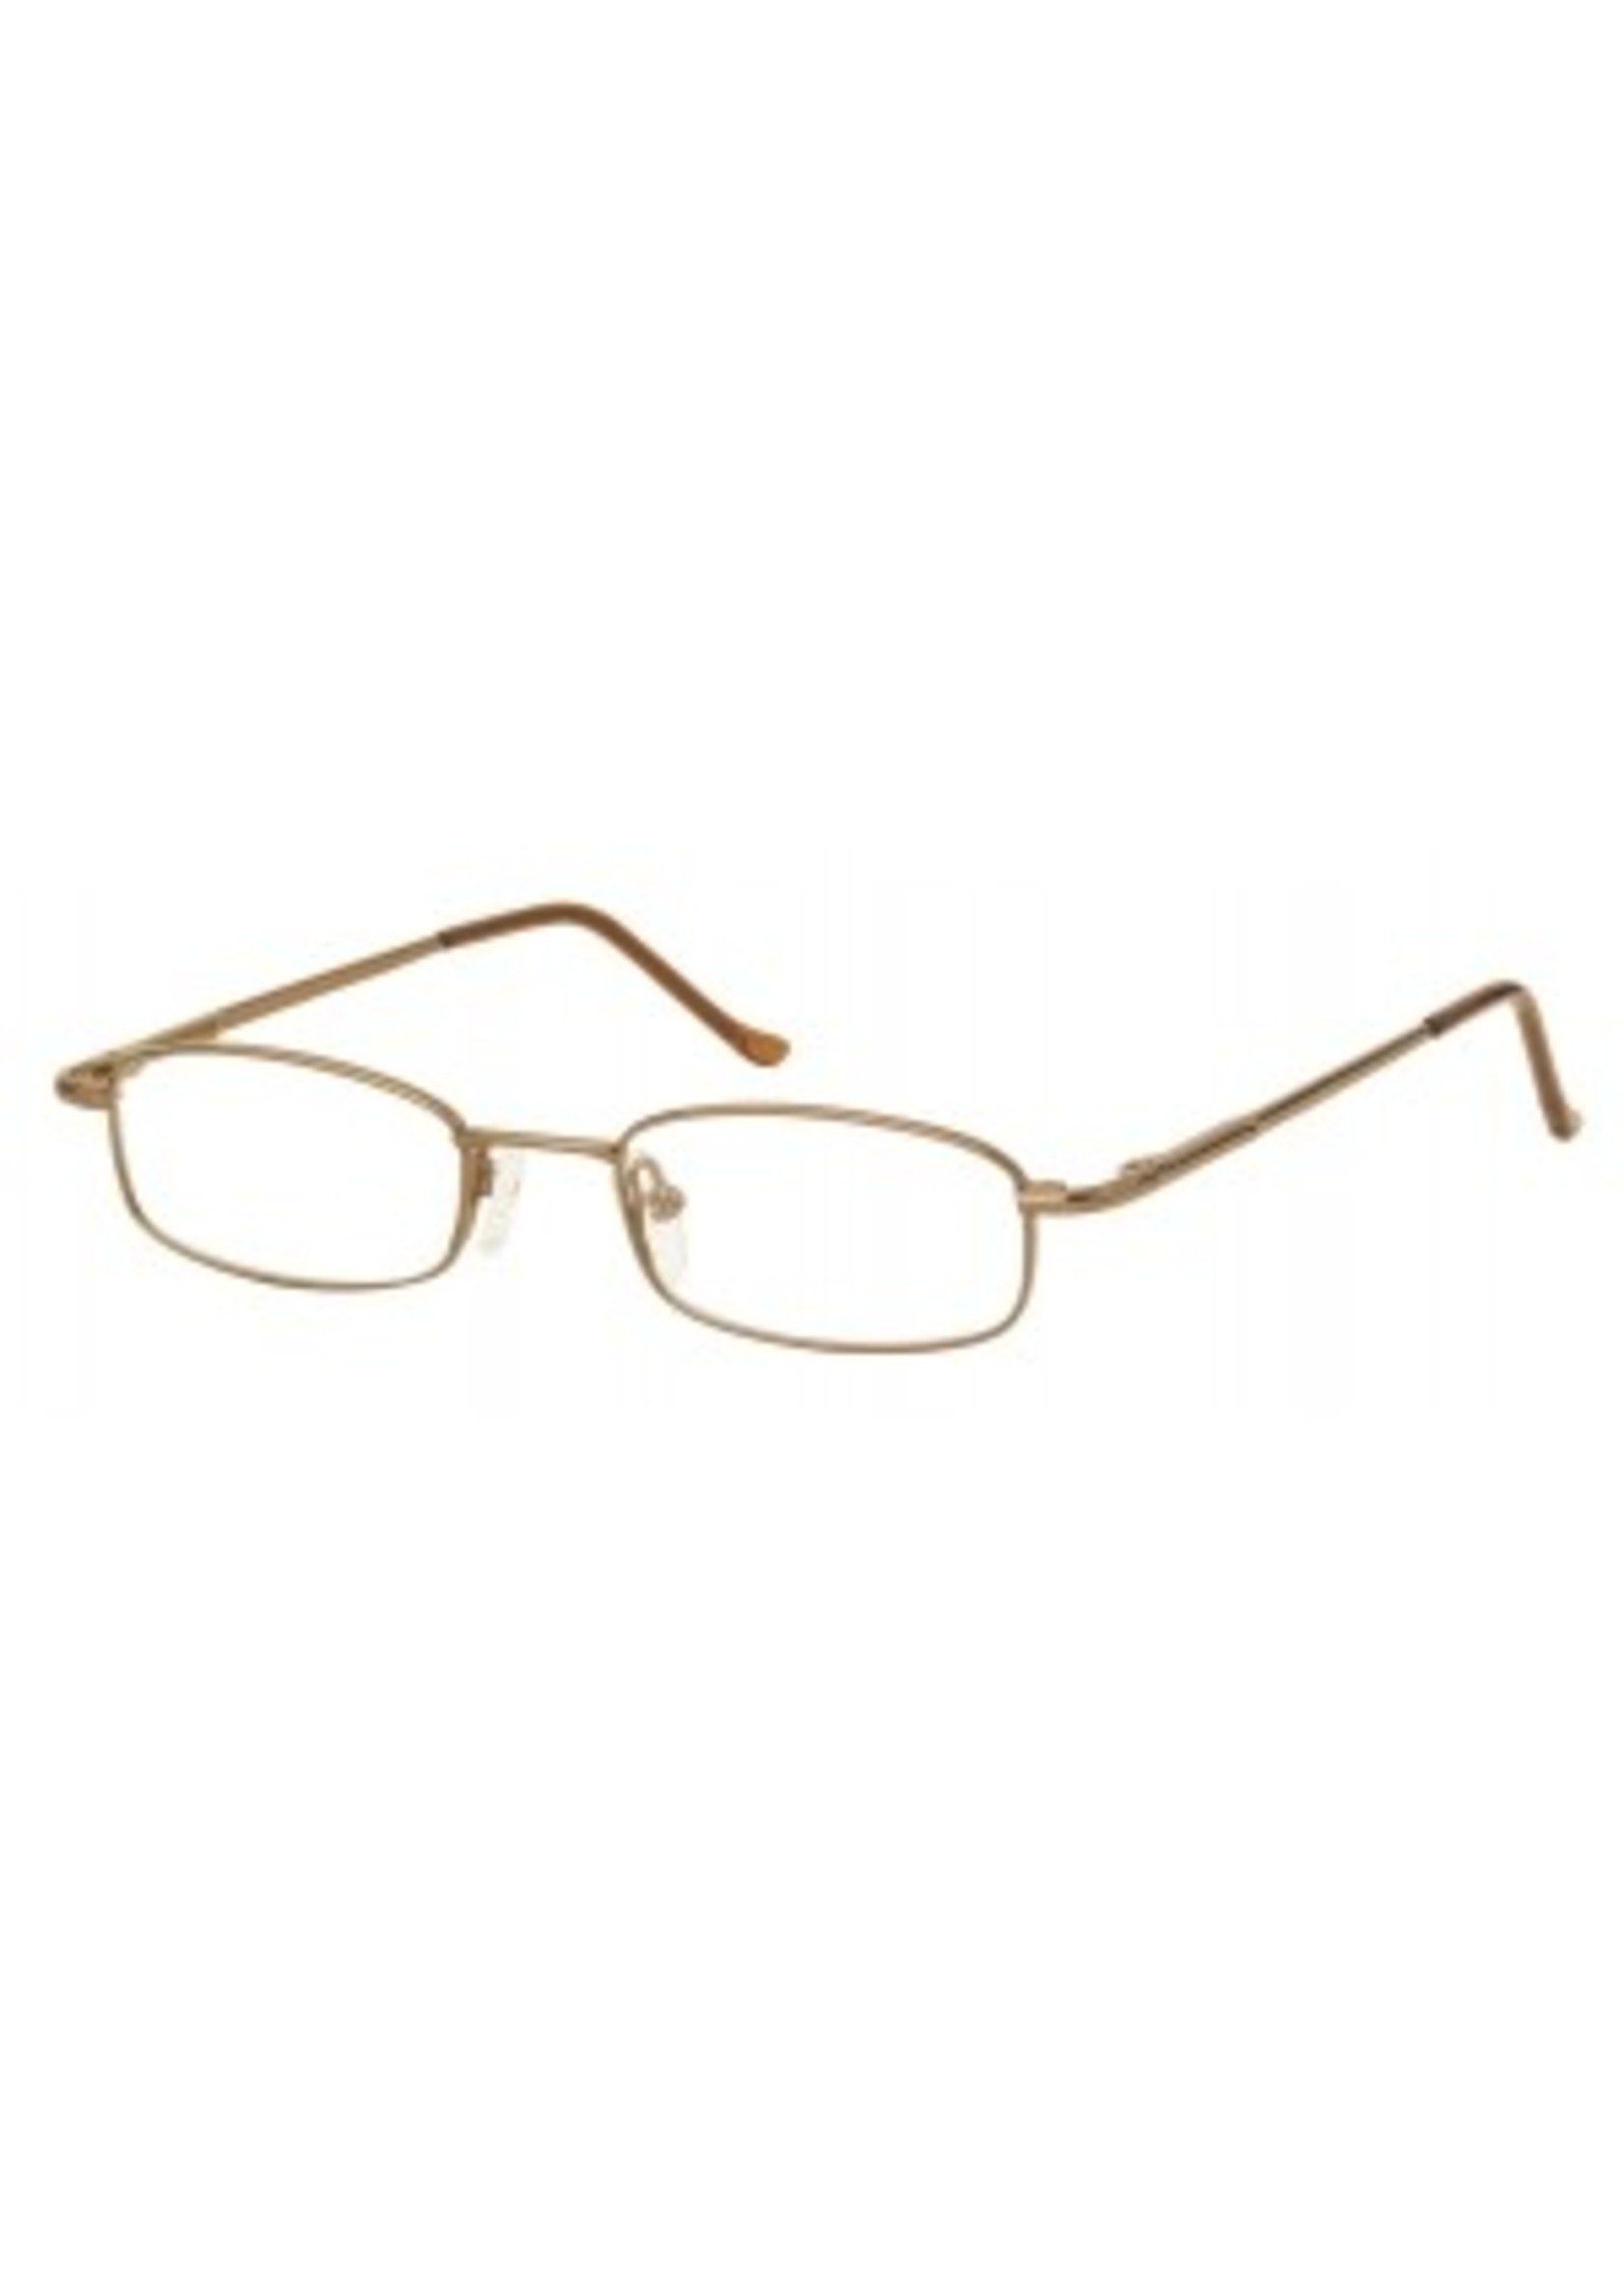 Tijdloze klassieke leesbril in goudkleur